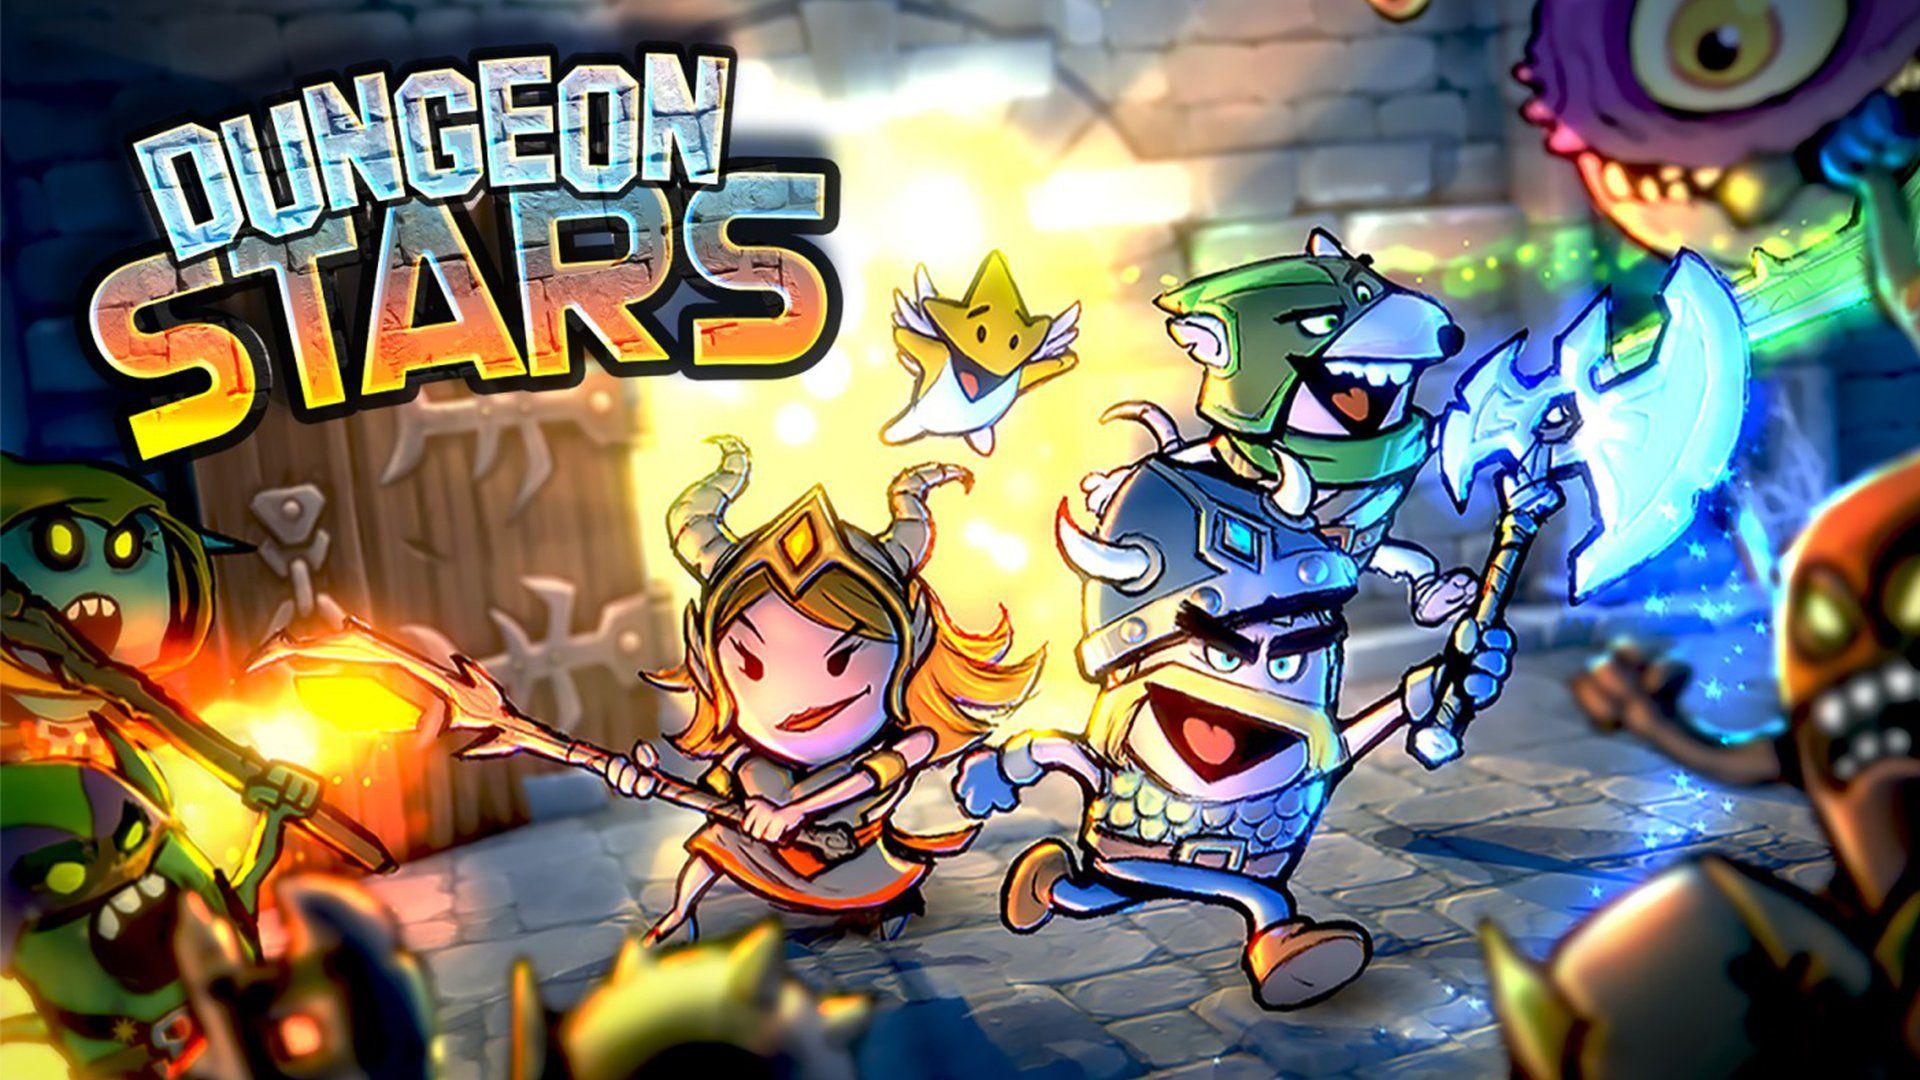 Dungeon Stars Launching on Nintendo Switch February 19